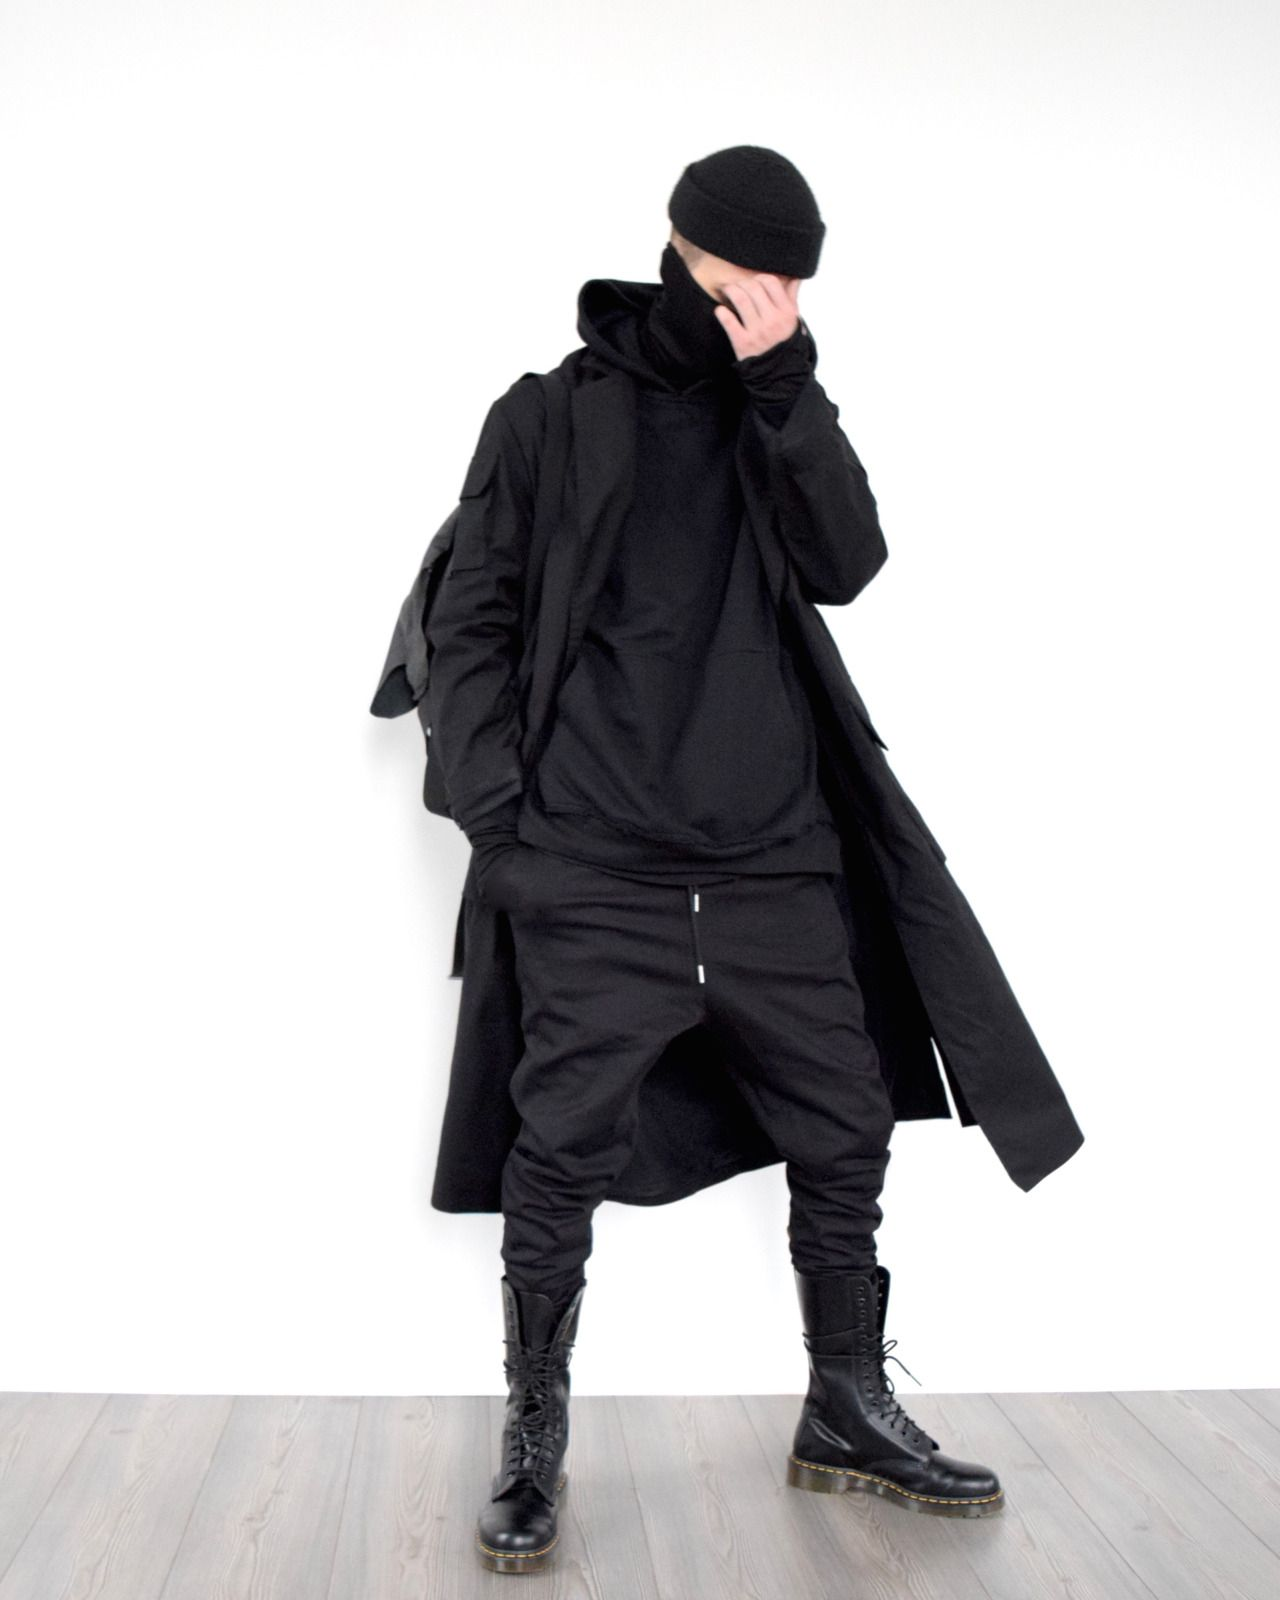 M X D V S — mxdvs: Matrix Ninja Fisherman beanie, Asos...